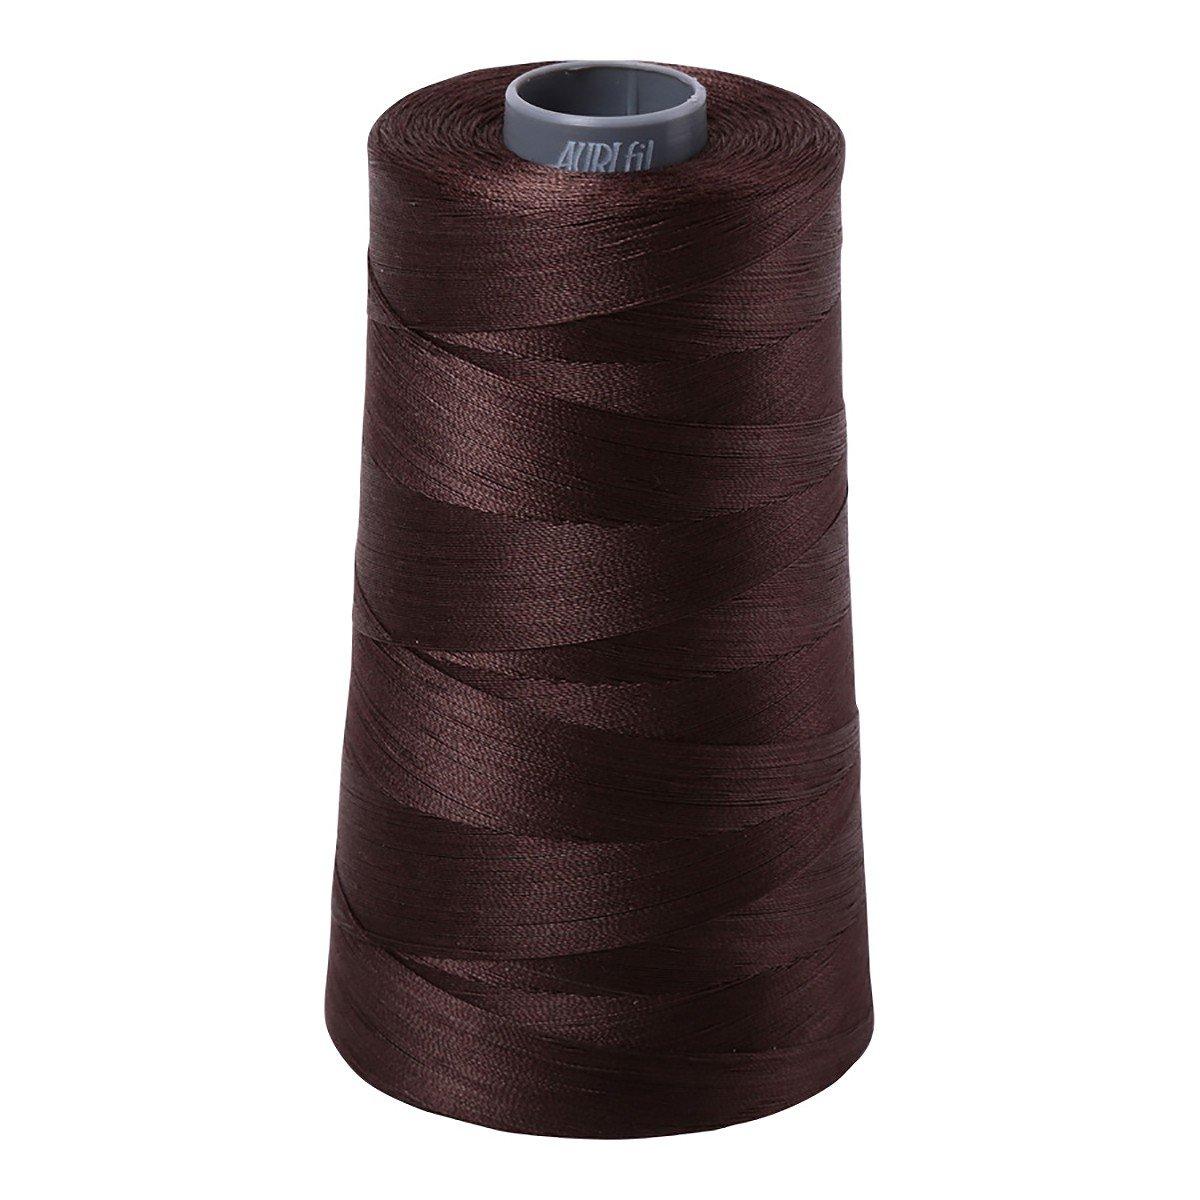 Mako (Cotton) Embroidery Thread 28wt 3609yds Dark Brown